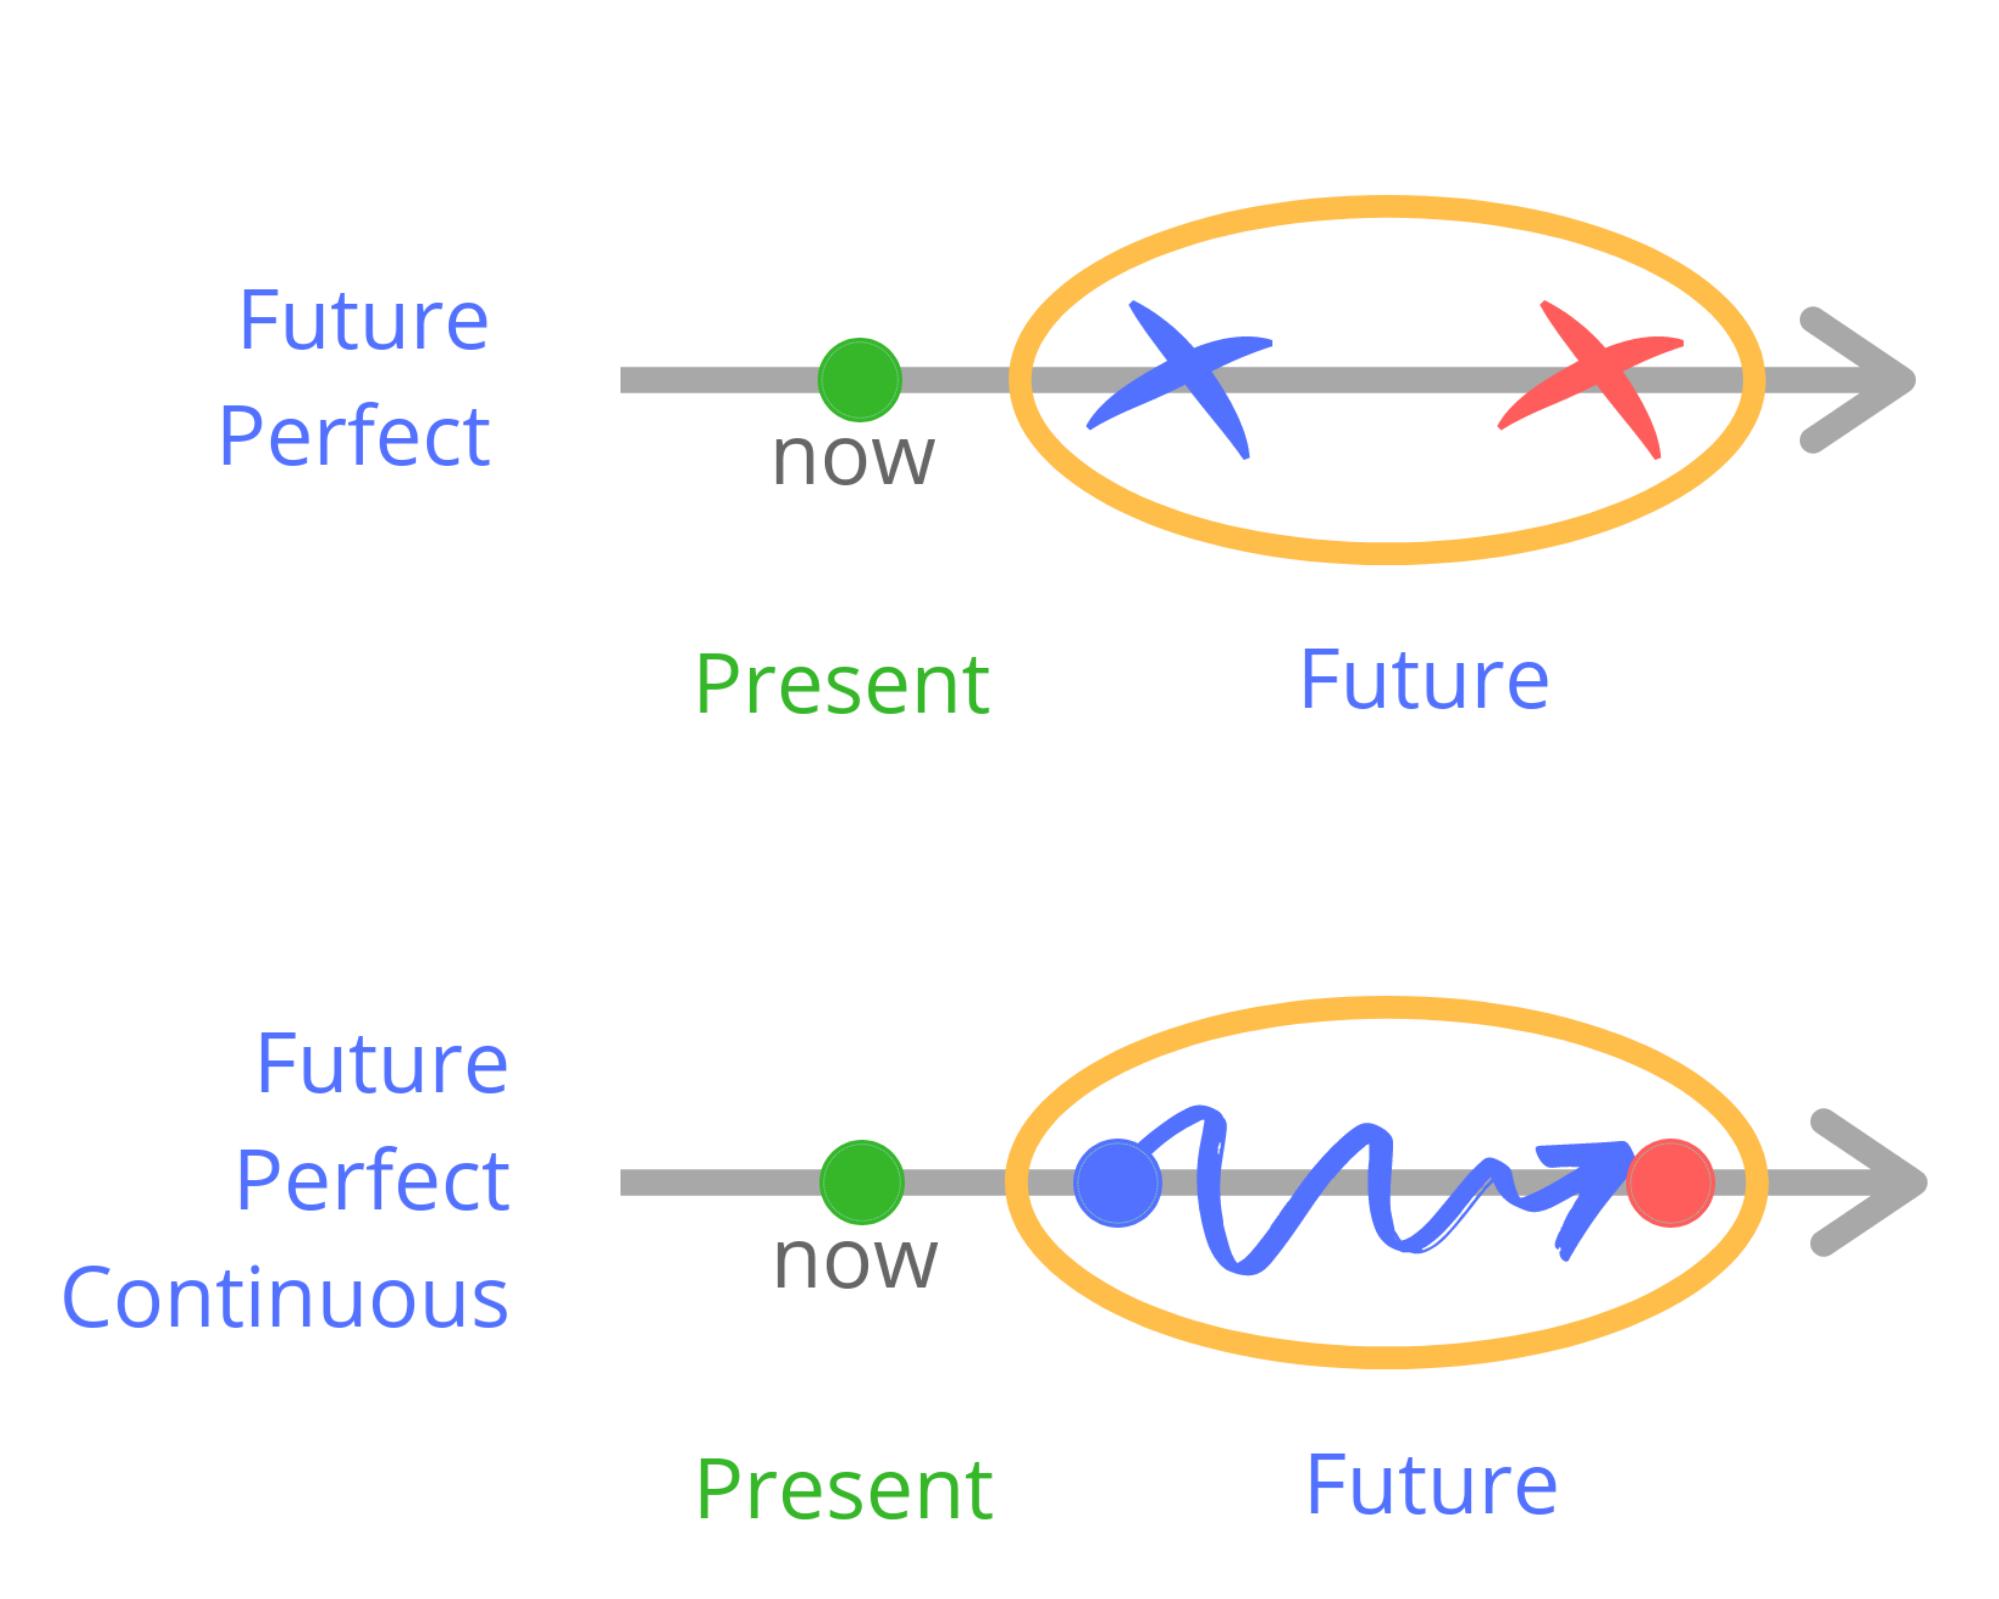 Сравнение Future Perfect и Future Perfect Continuous